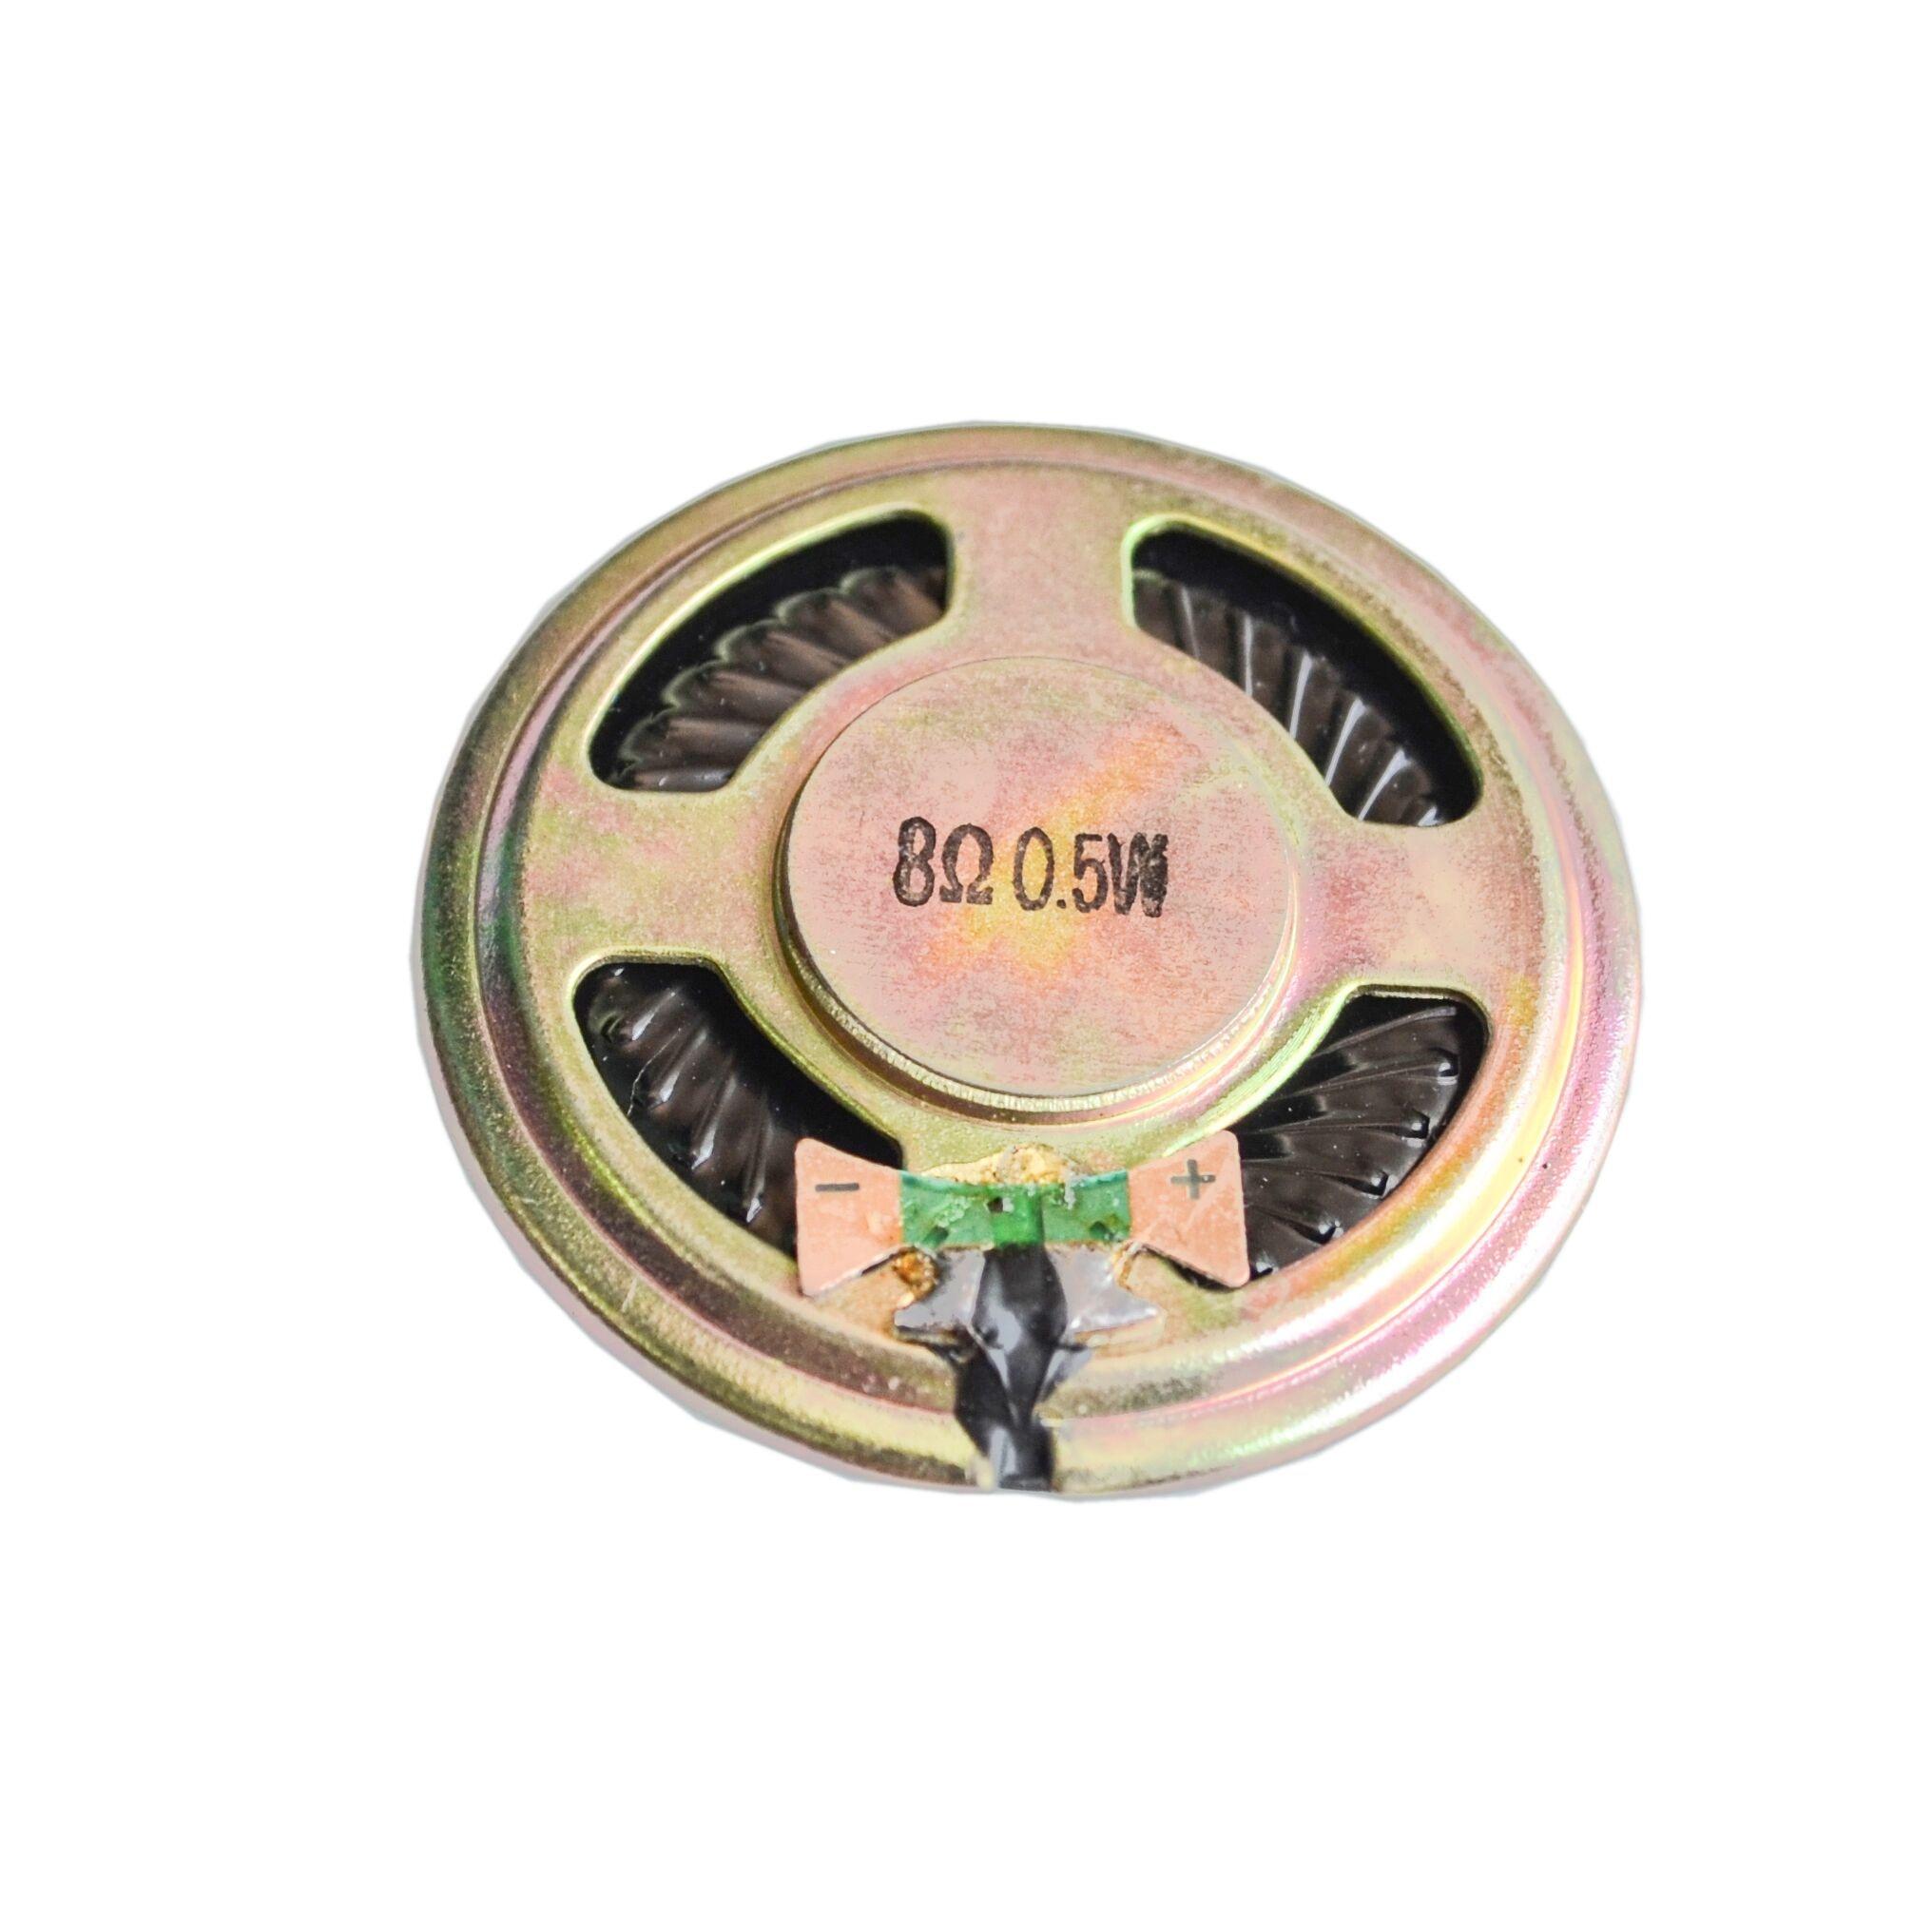 2PCS/Lot New 8 ohm 0.5W Horn speaker 40MM 4CM diameter 8R 0.5W Small loudspeaker Wholesale Electronic